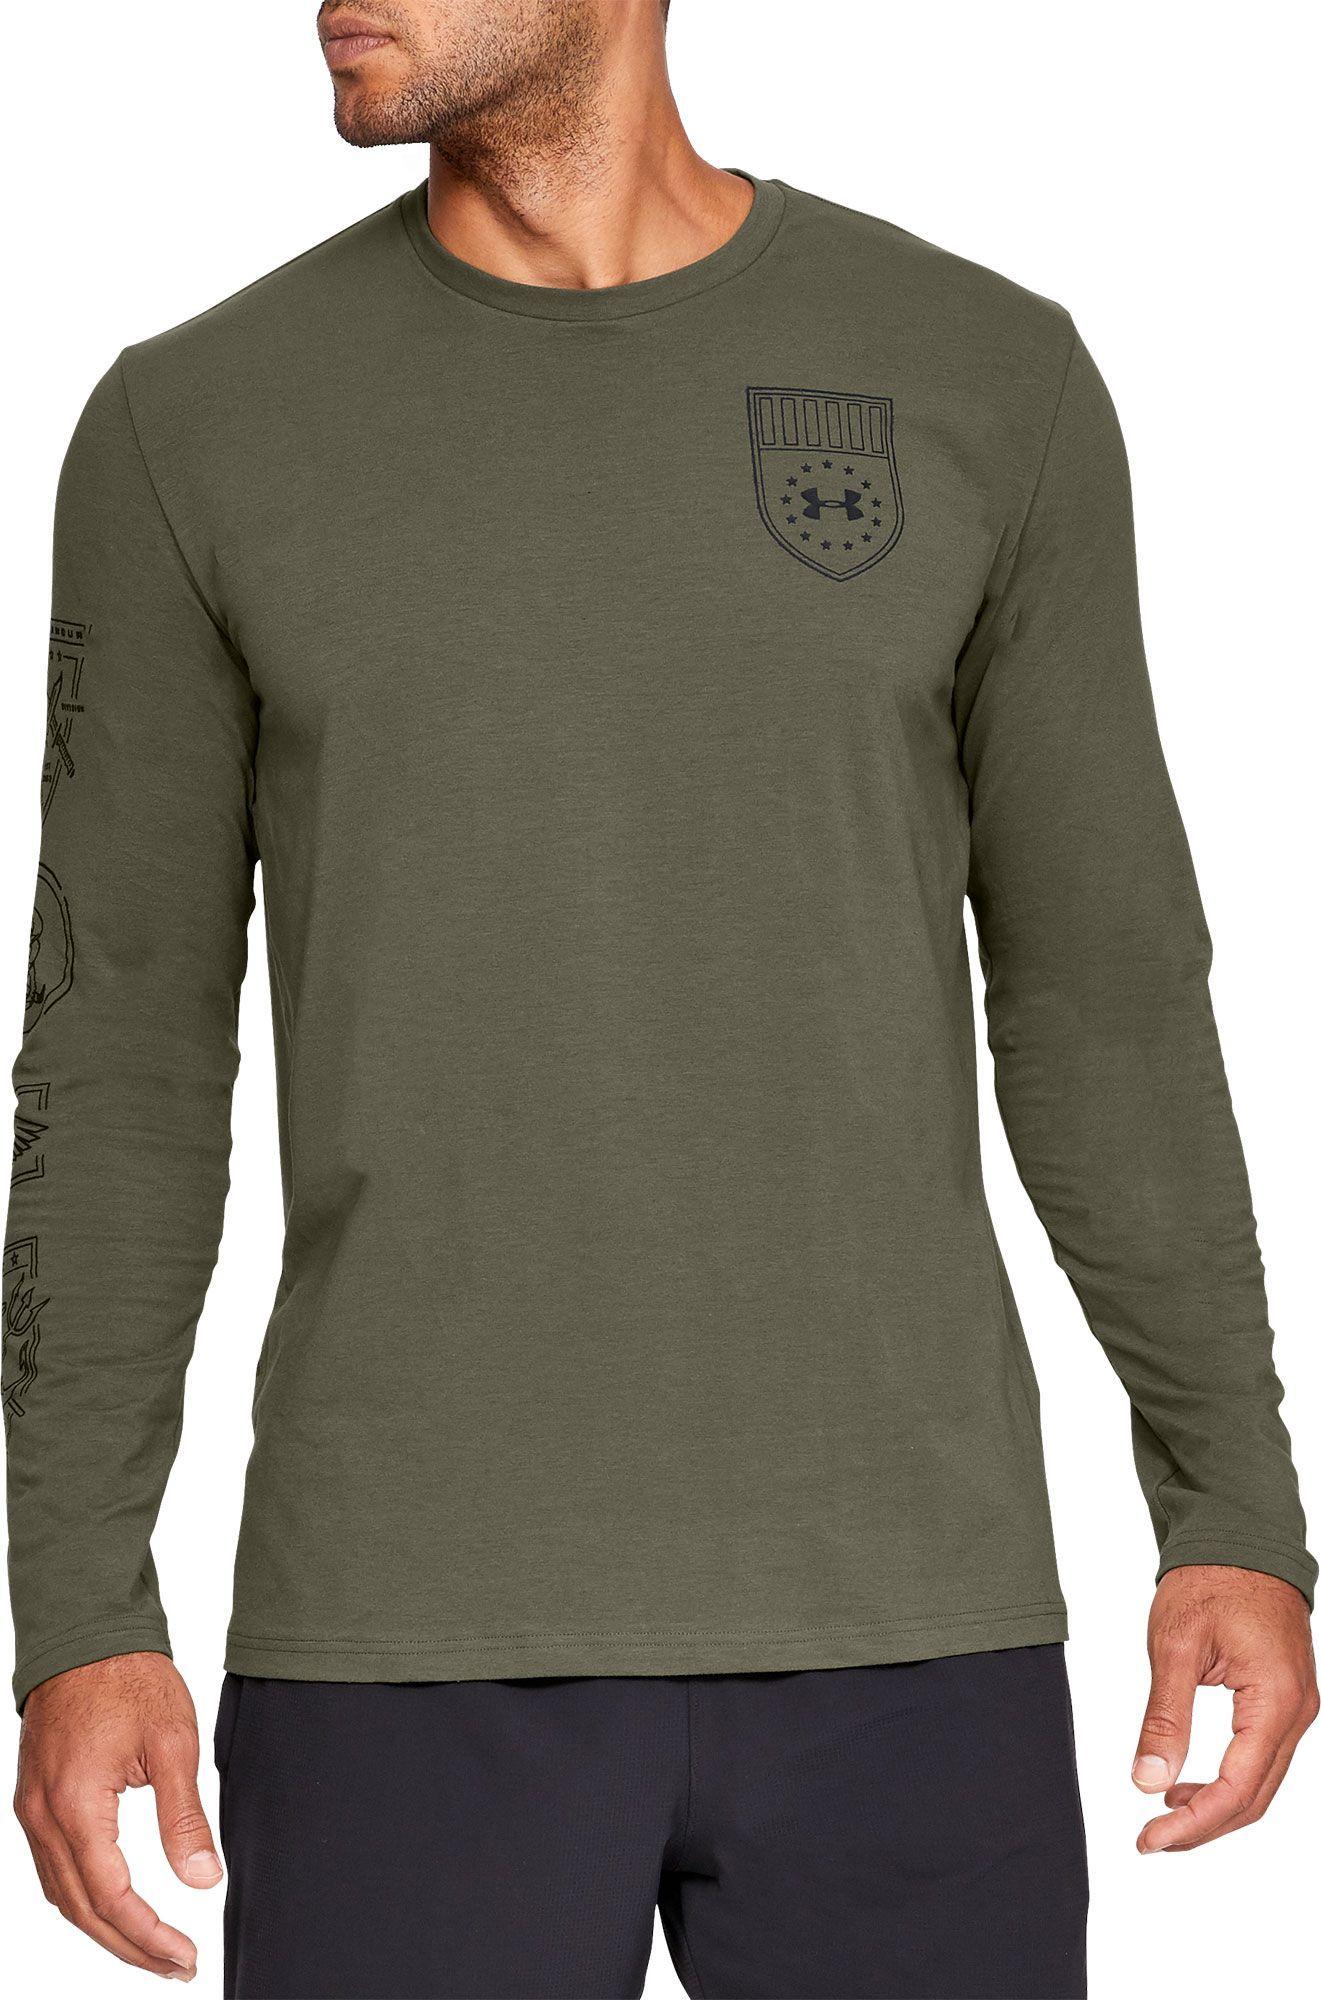 e63af9a132 Under Armour Men's Tactical Graphic Long Sleeve T-Shirt, Size: XXL ...